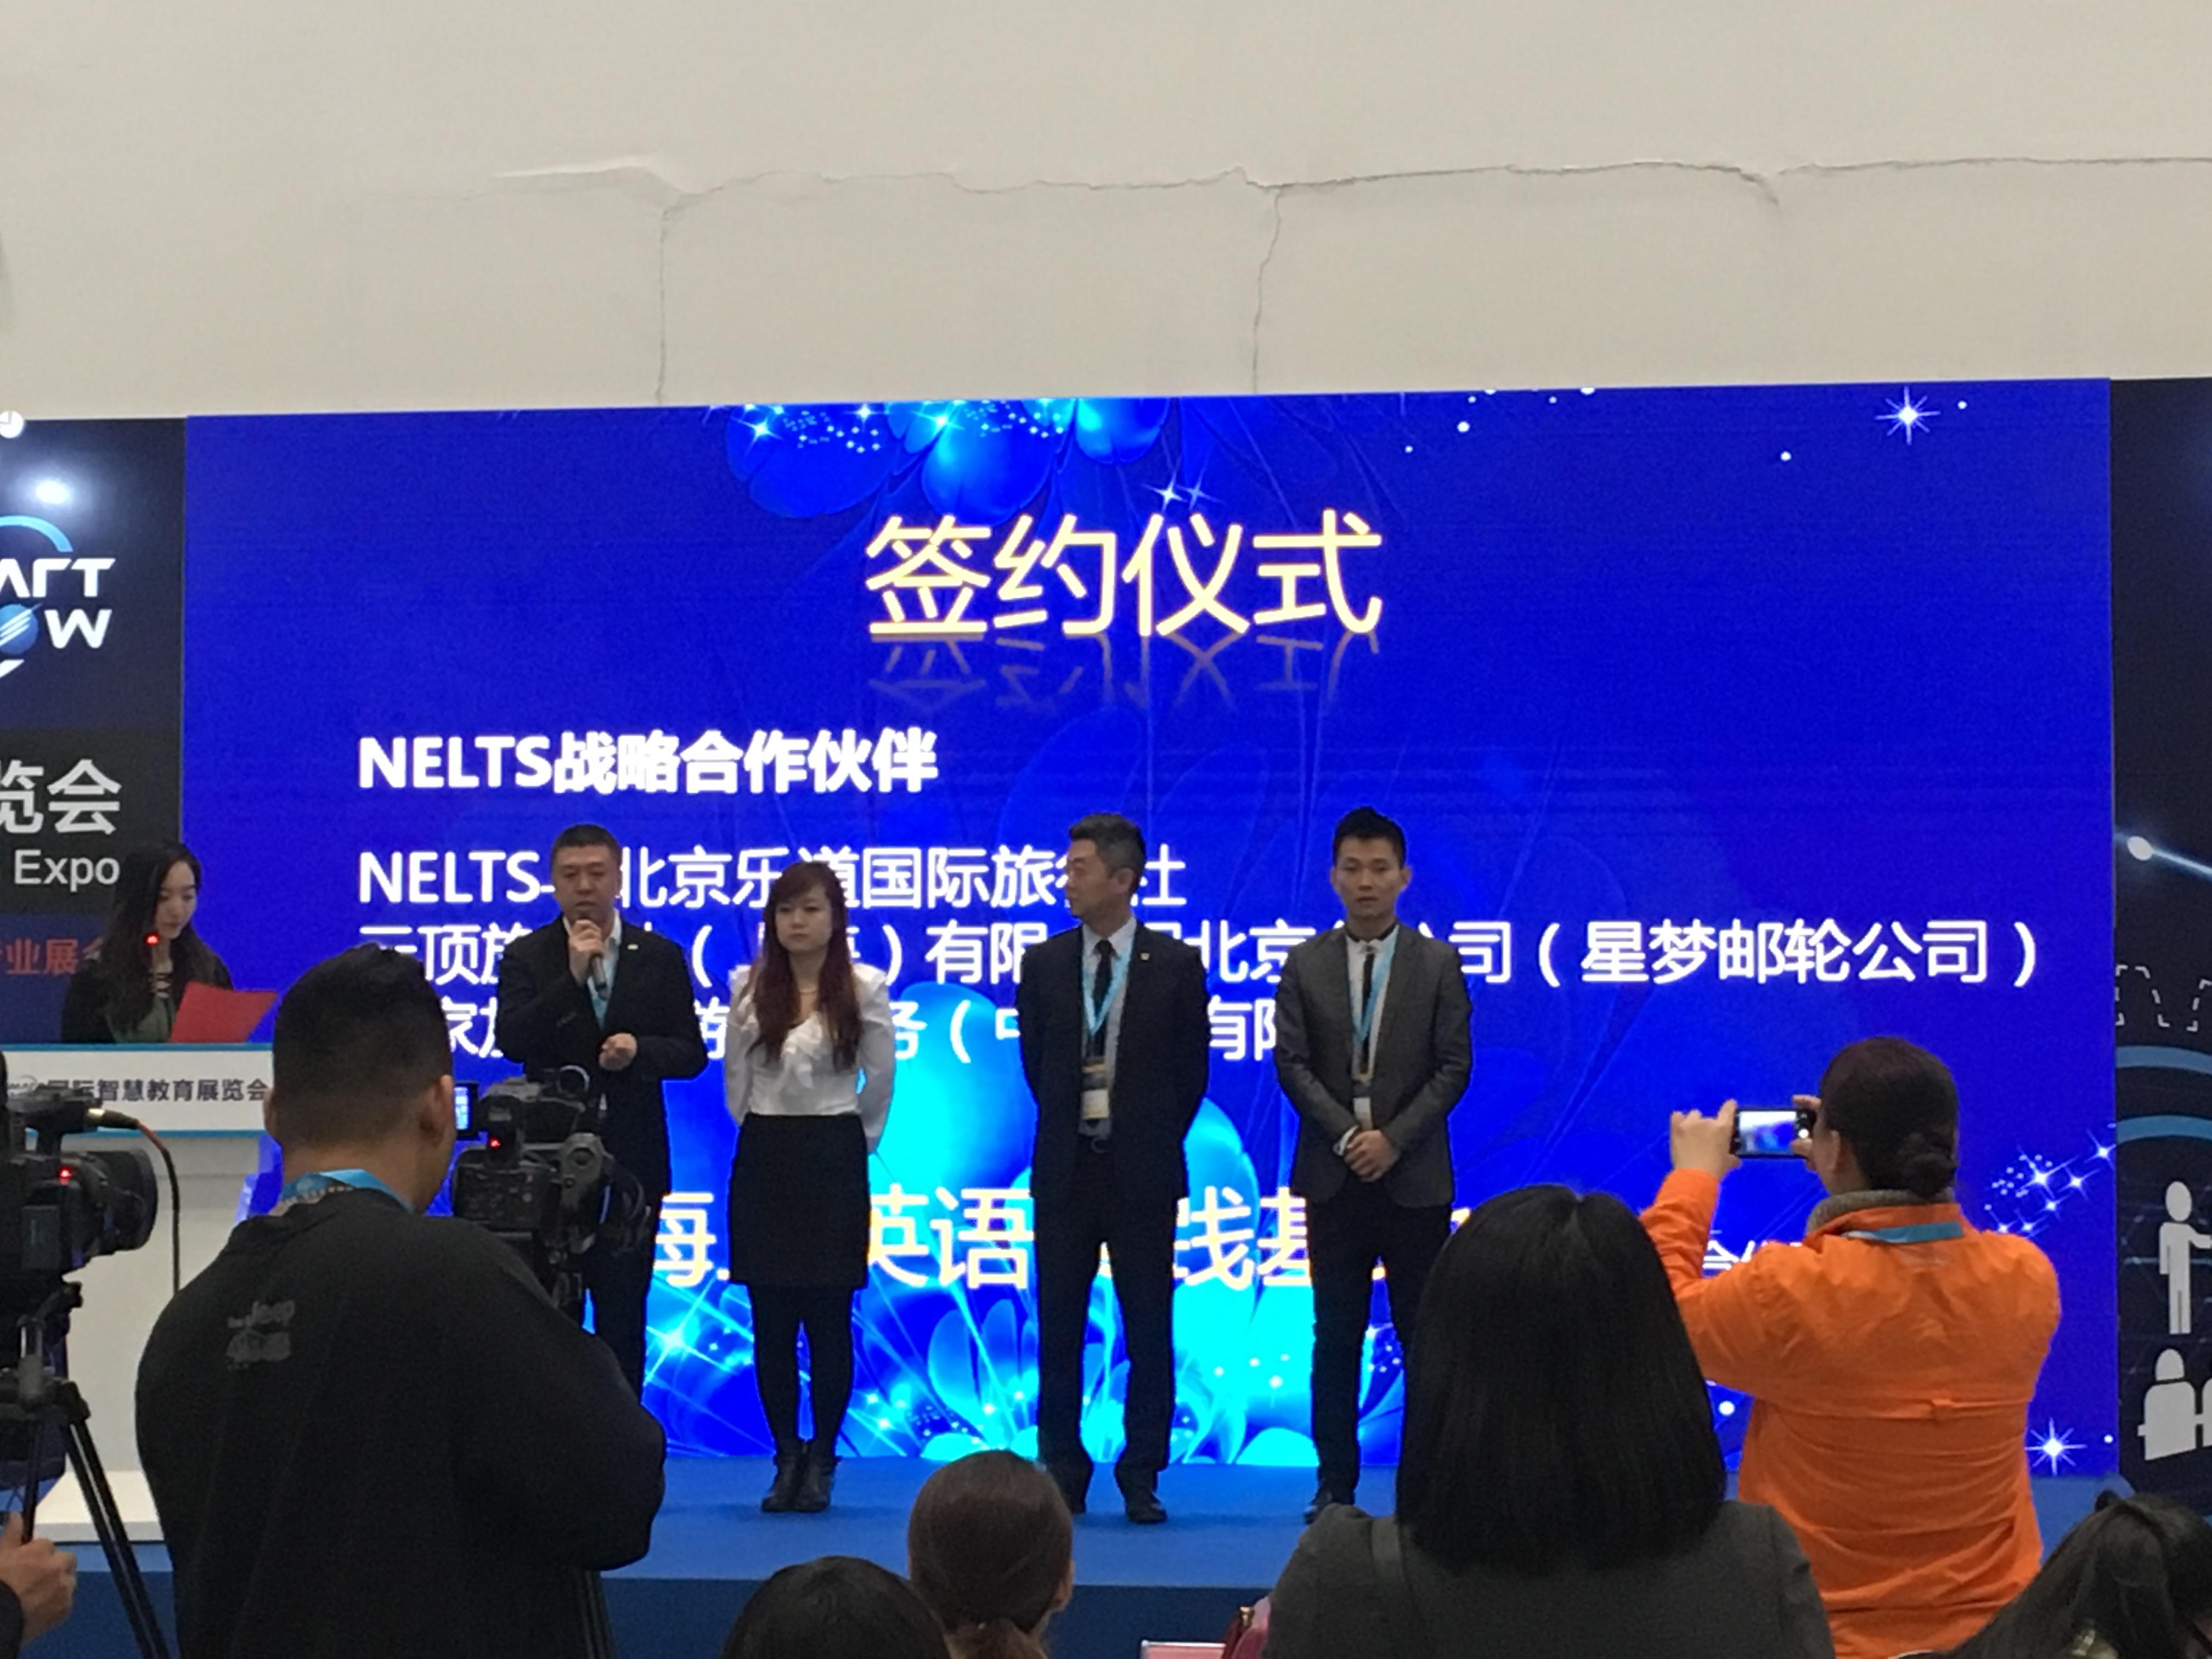 nelts还宣布将与北京乐道国际旅行社以及云顶集团星梦邮轮公司宣布